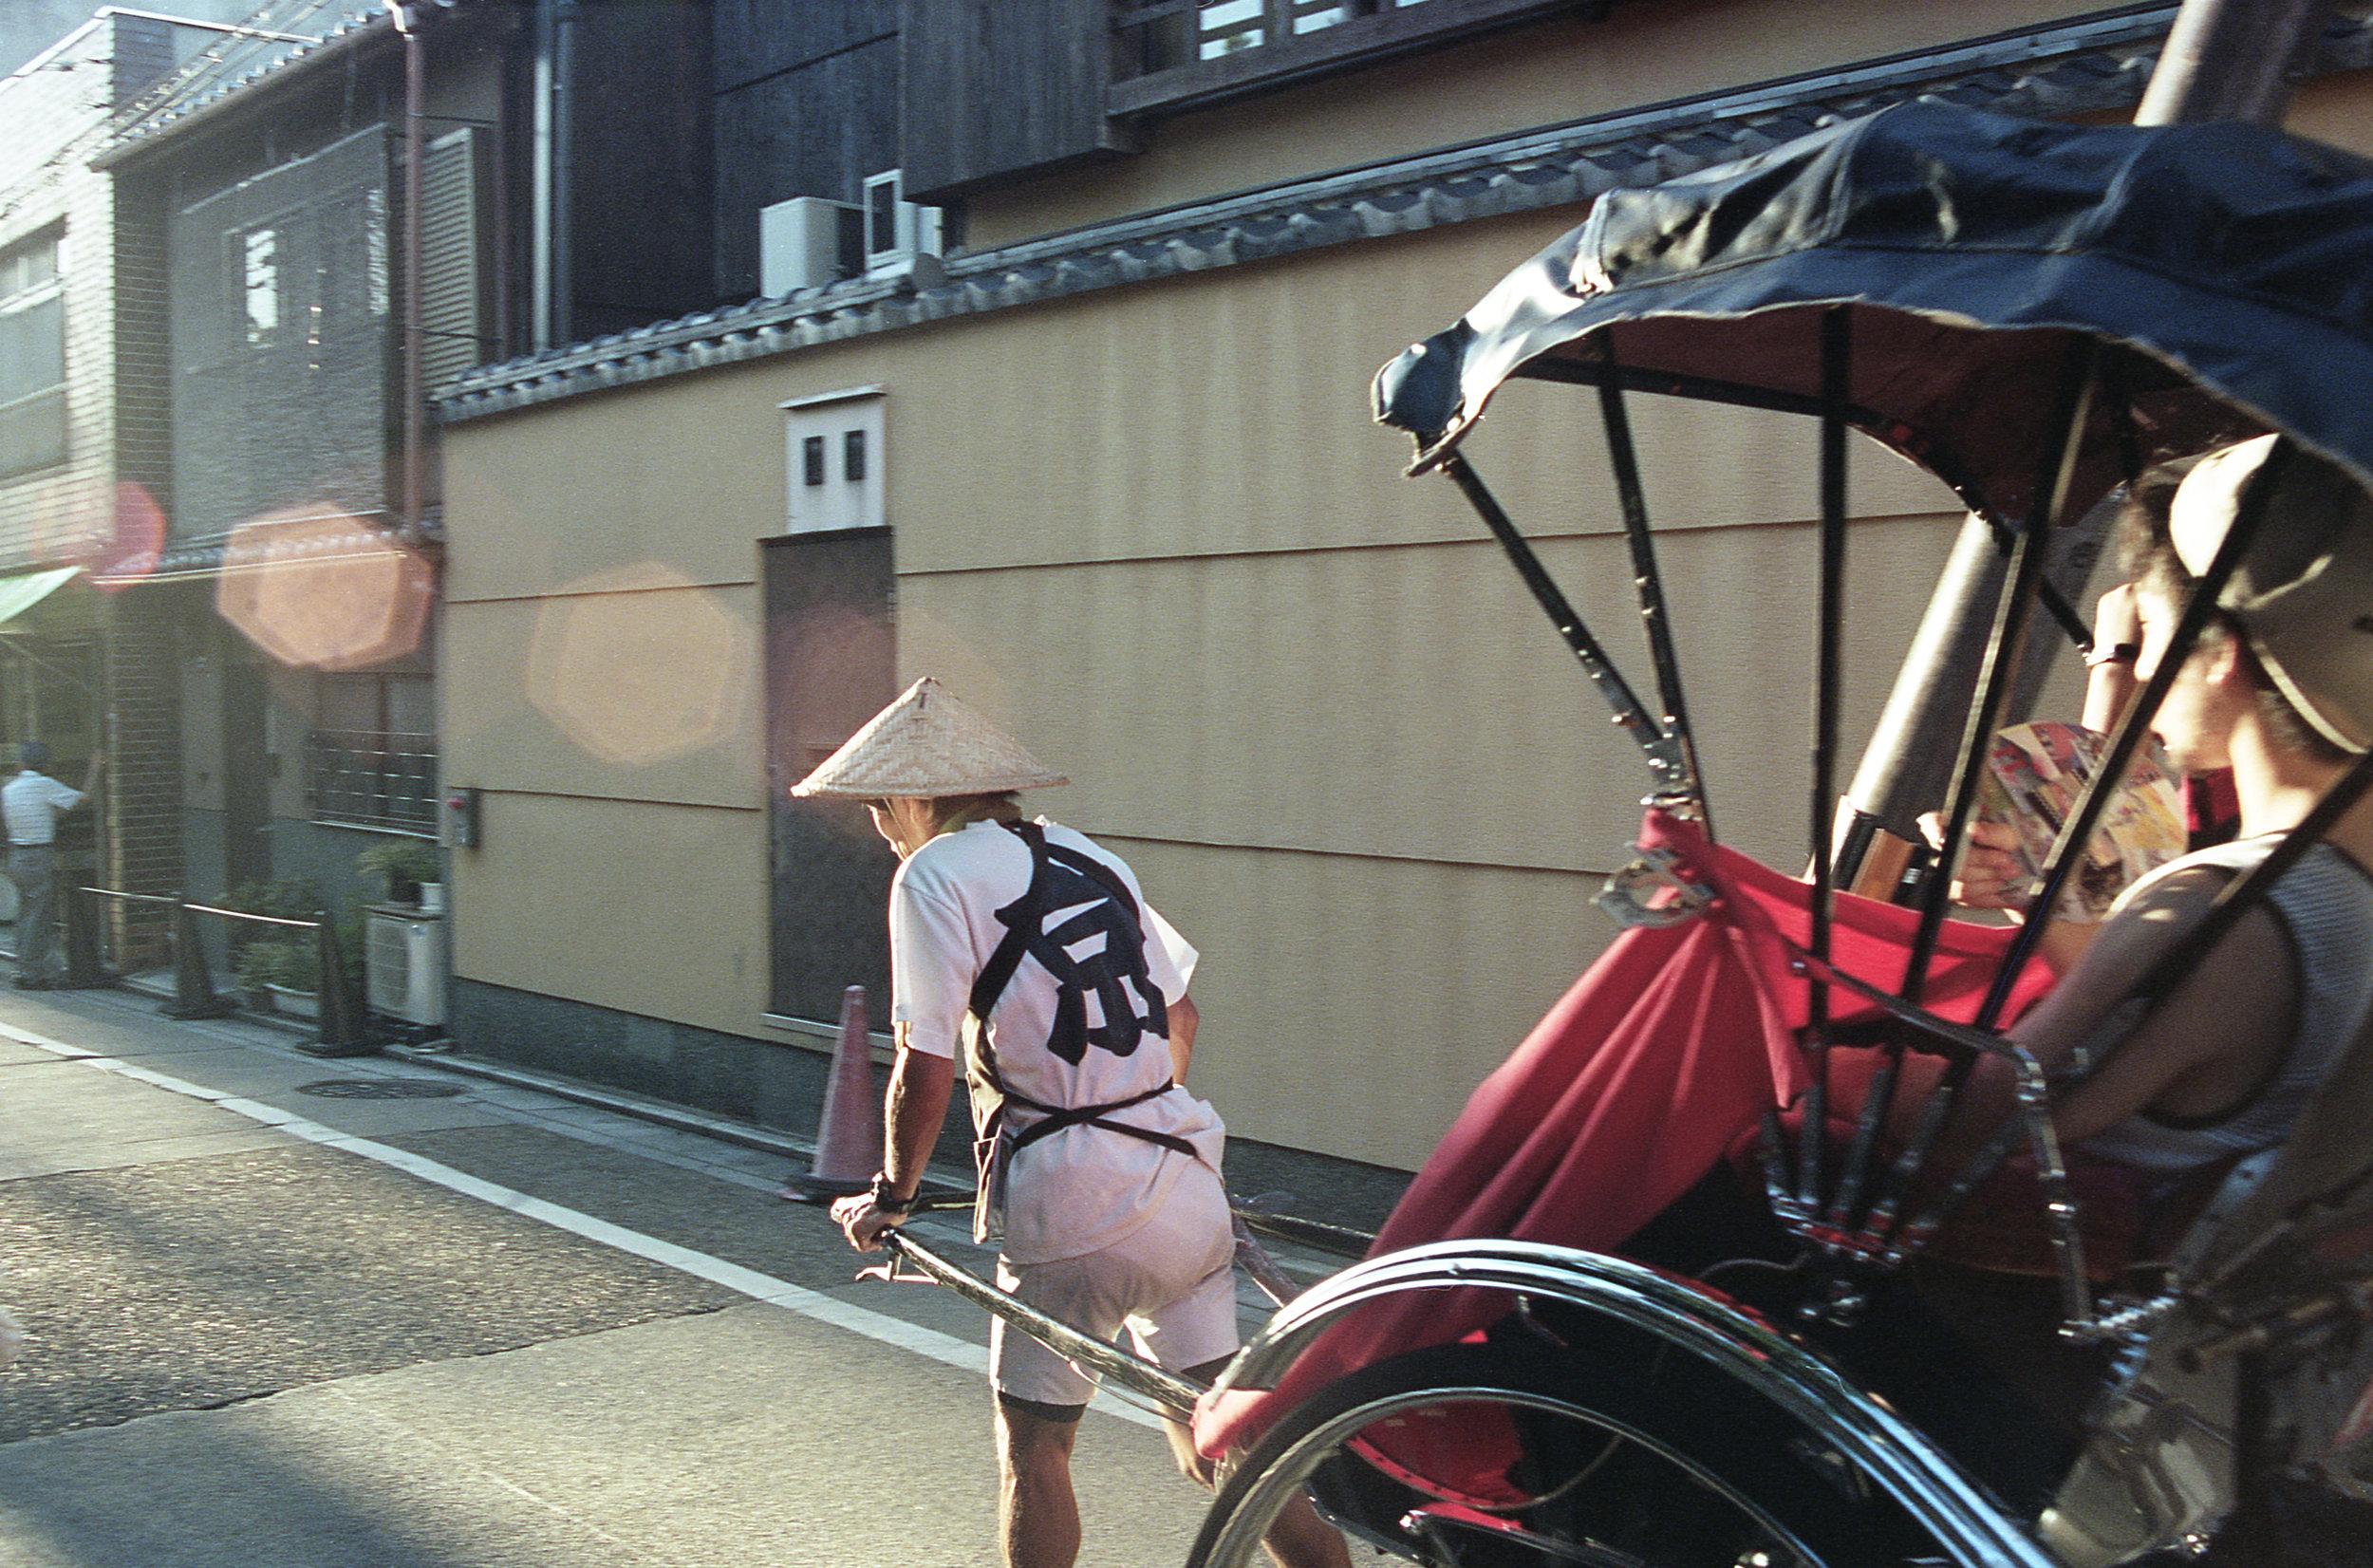 20180825_Train_Kyo_042.jpg